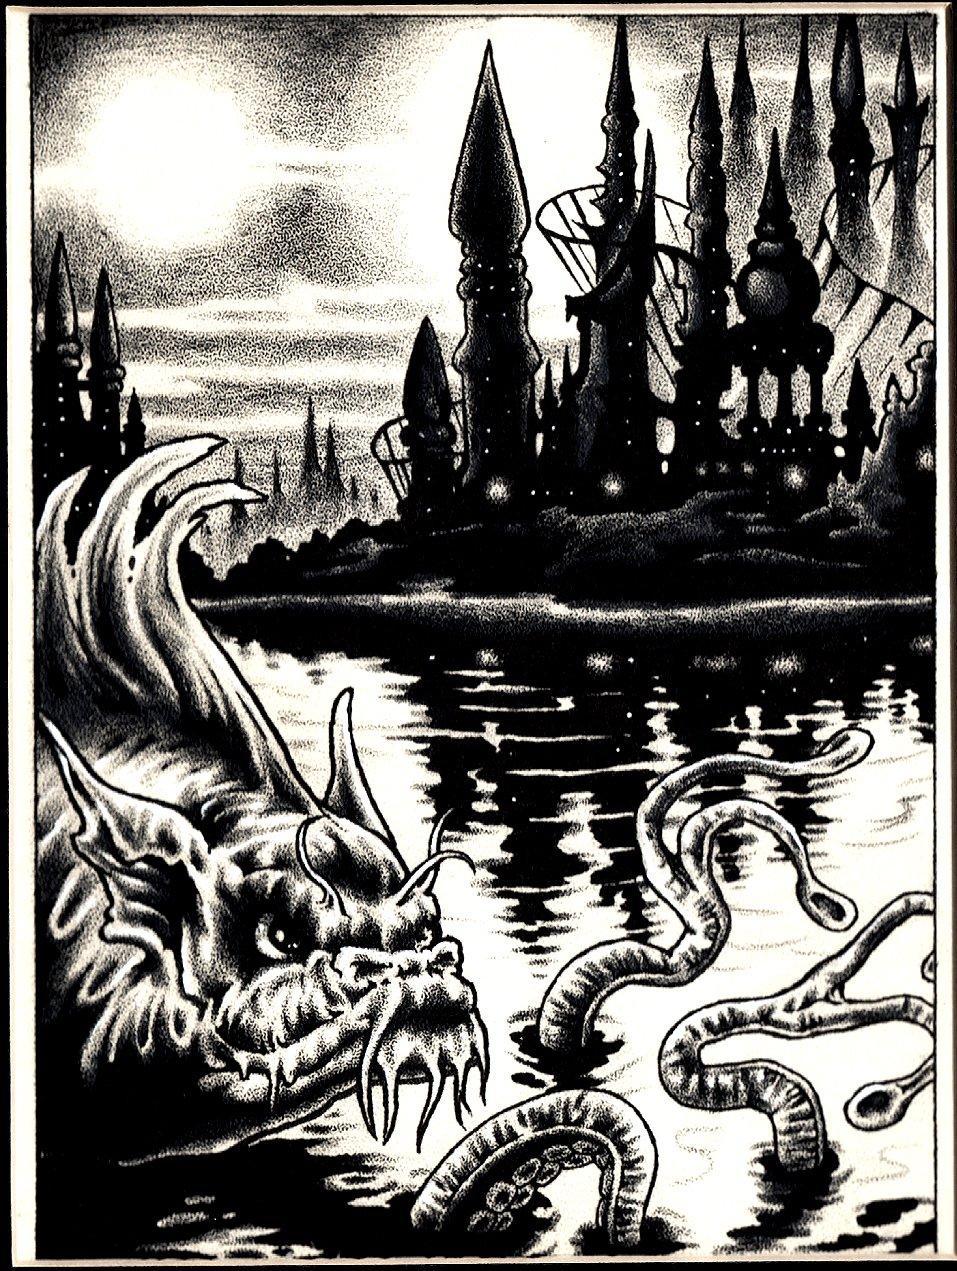 Swamp Creature Published Fanzine Pinup (1993)